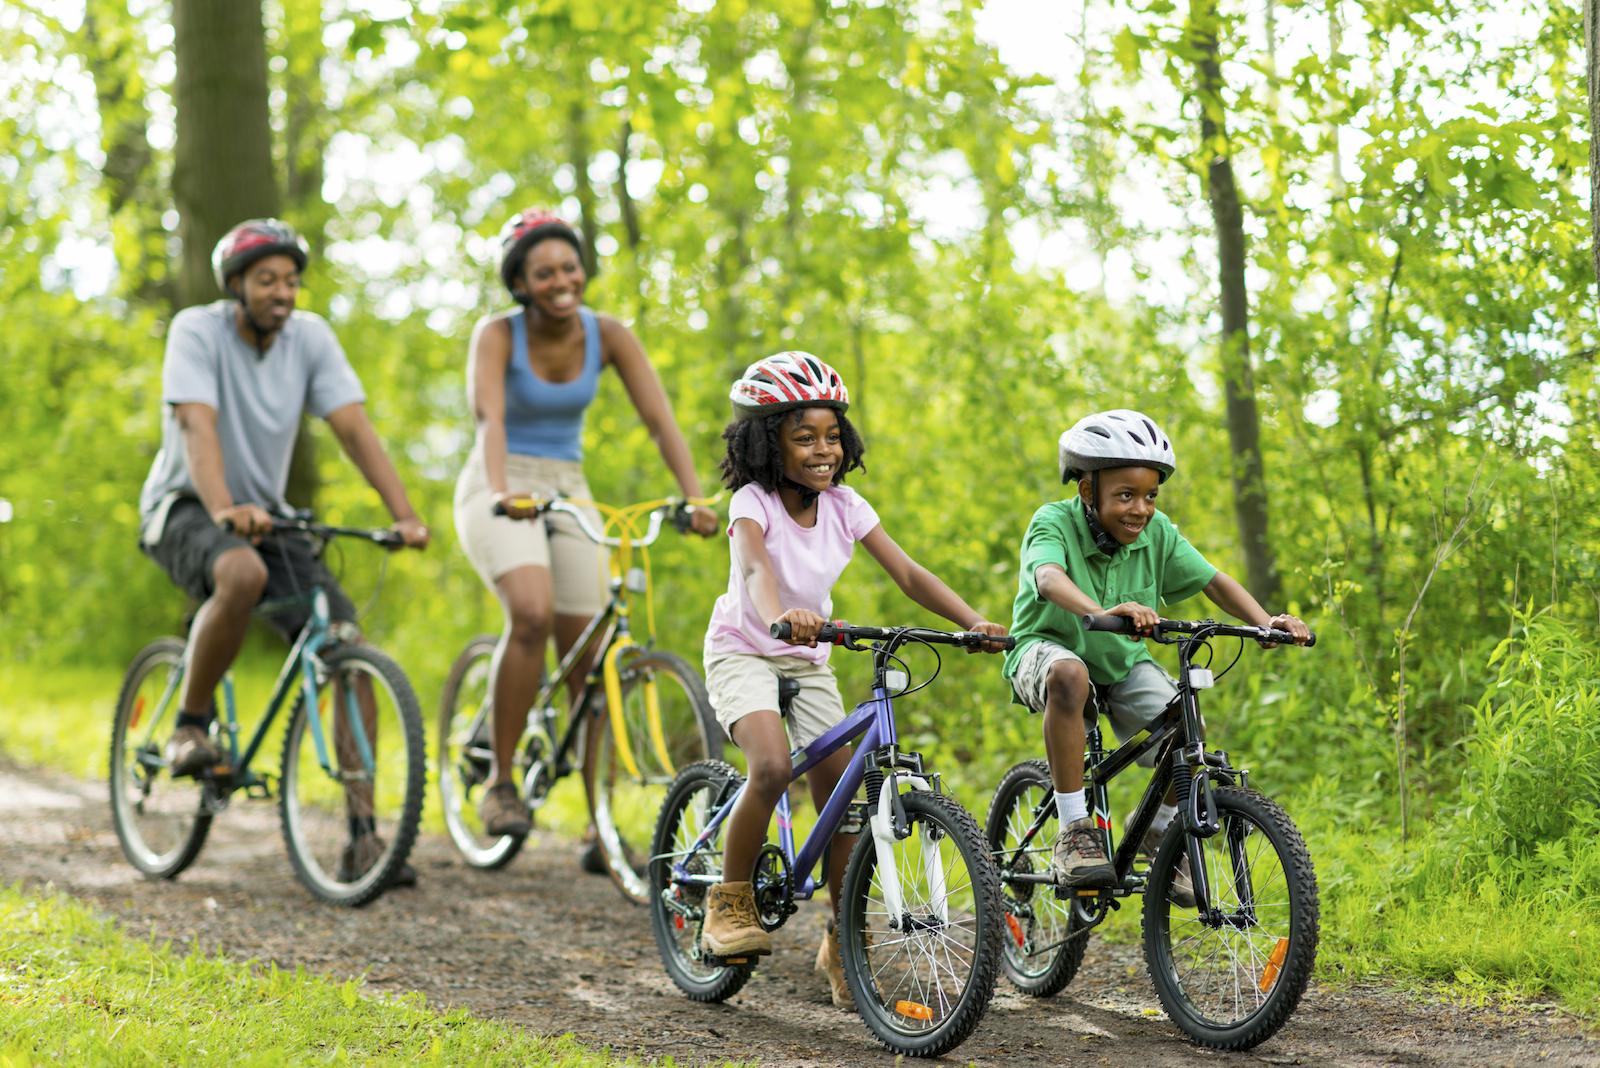 Family-Biking.jpg (1600×1068)